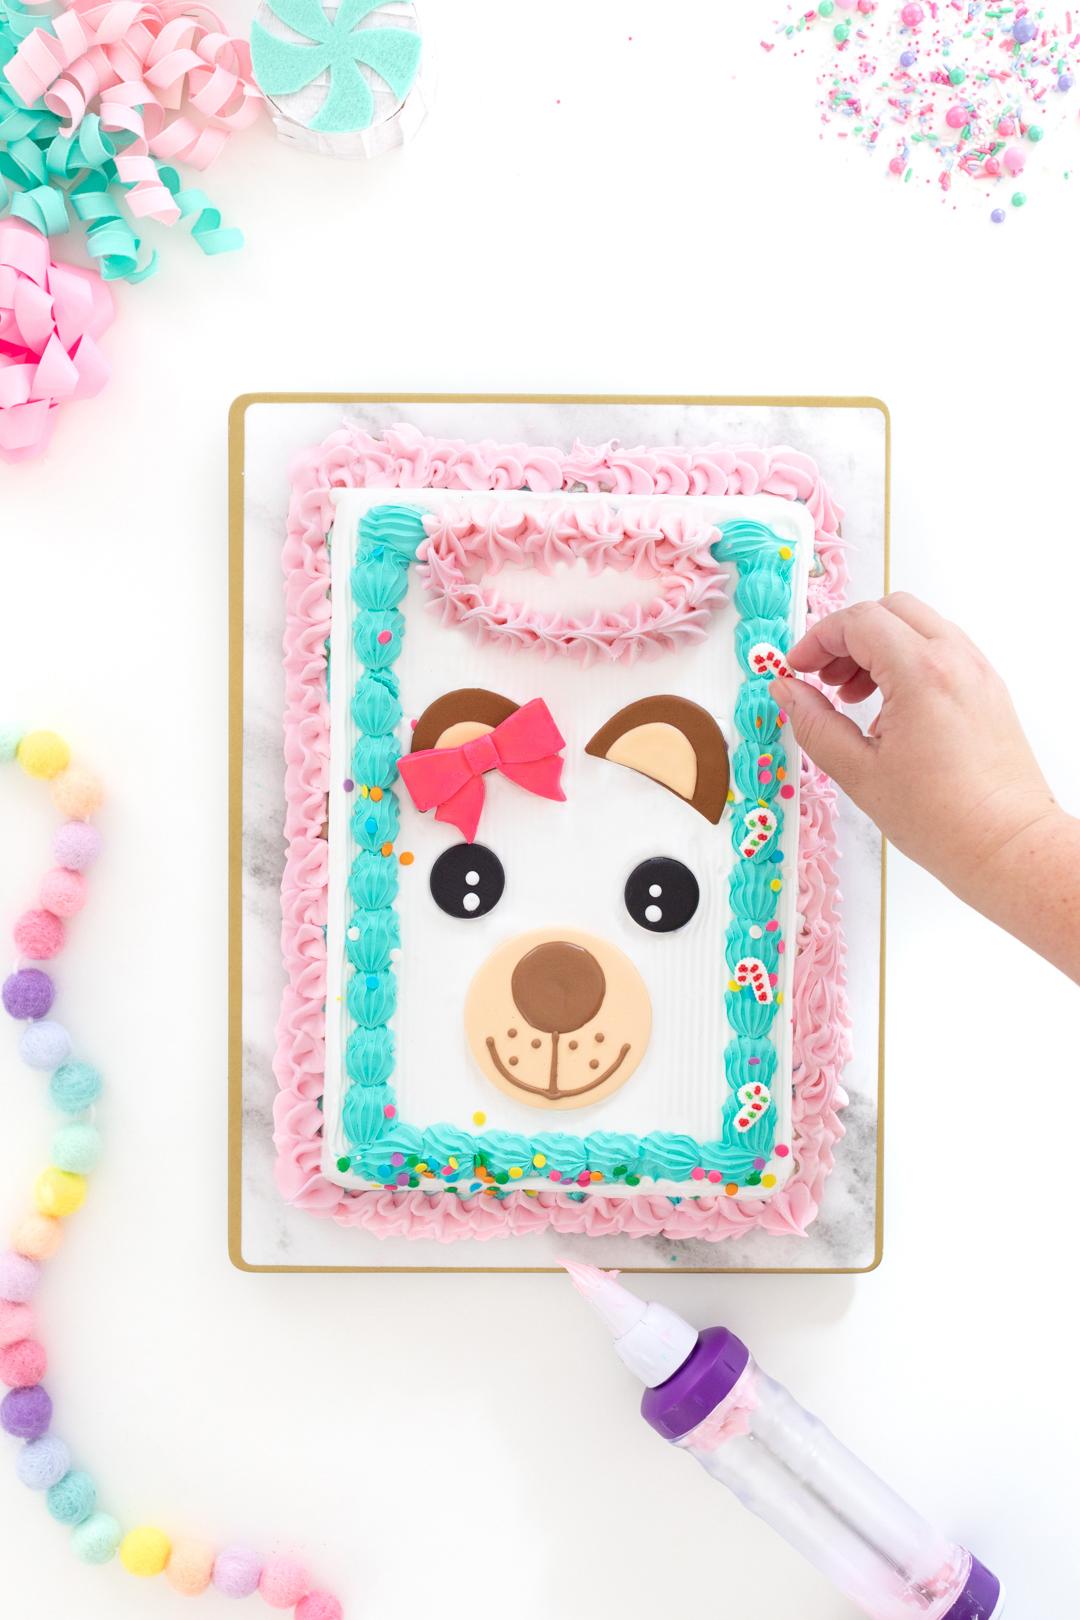 adding sprinkles to an ice cream cake